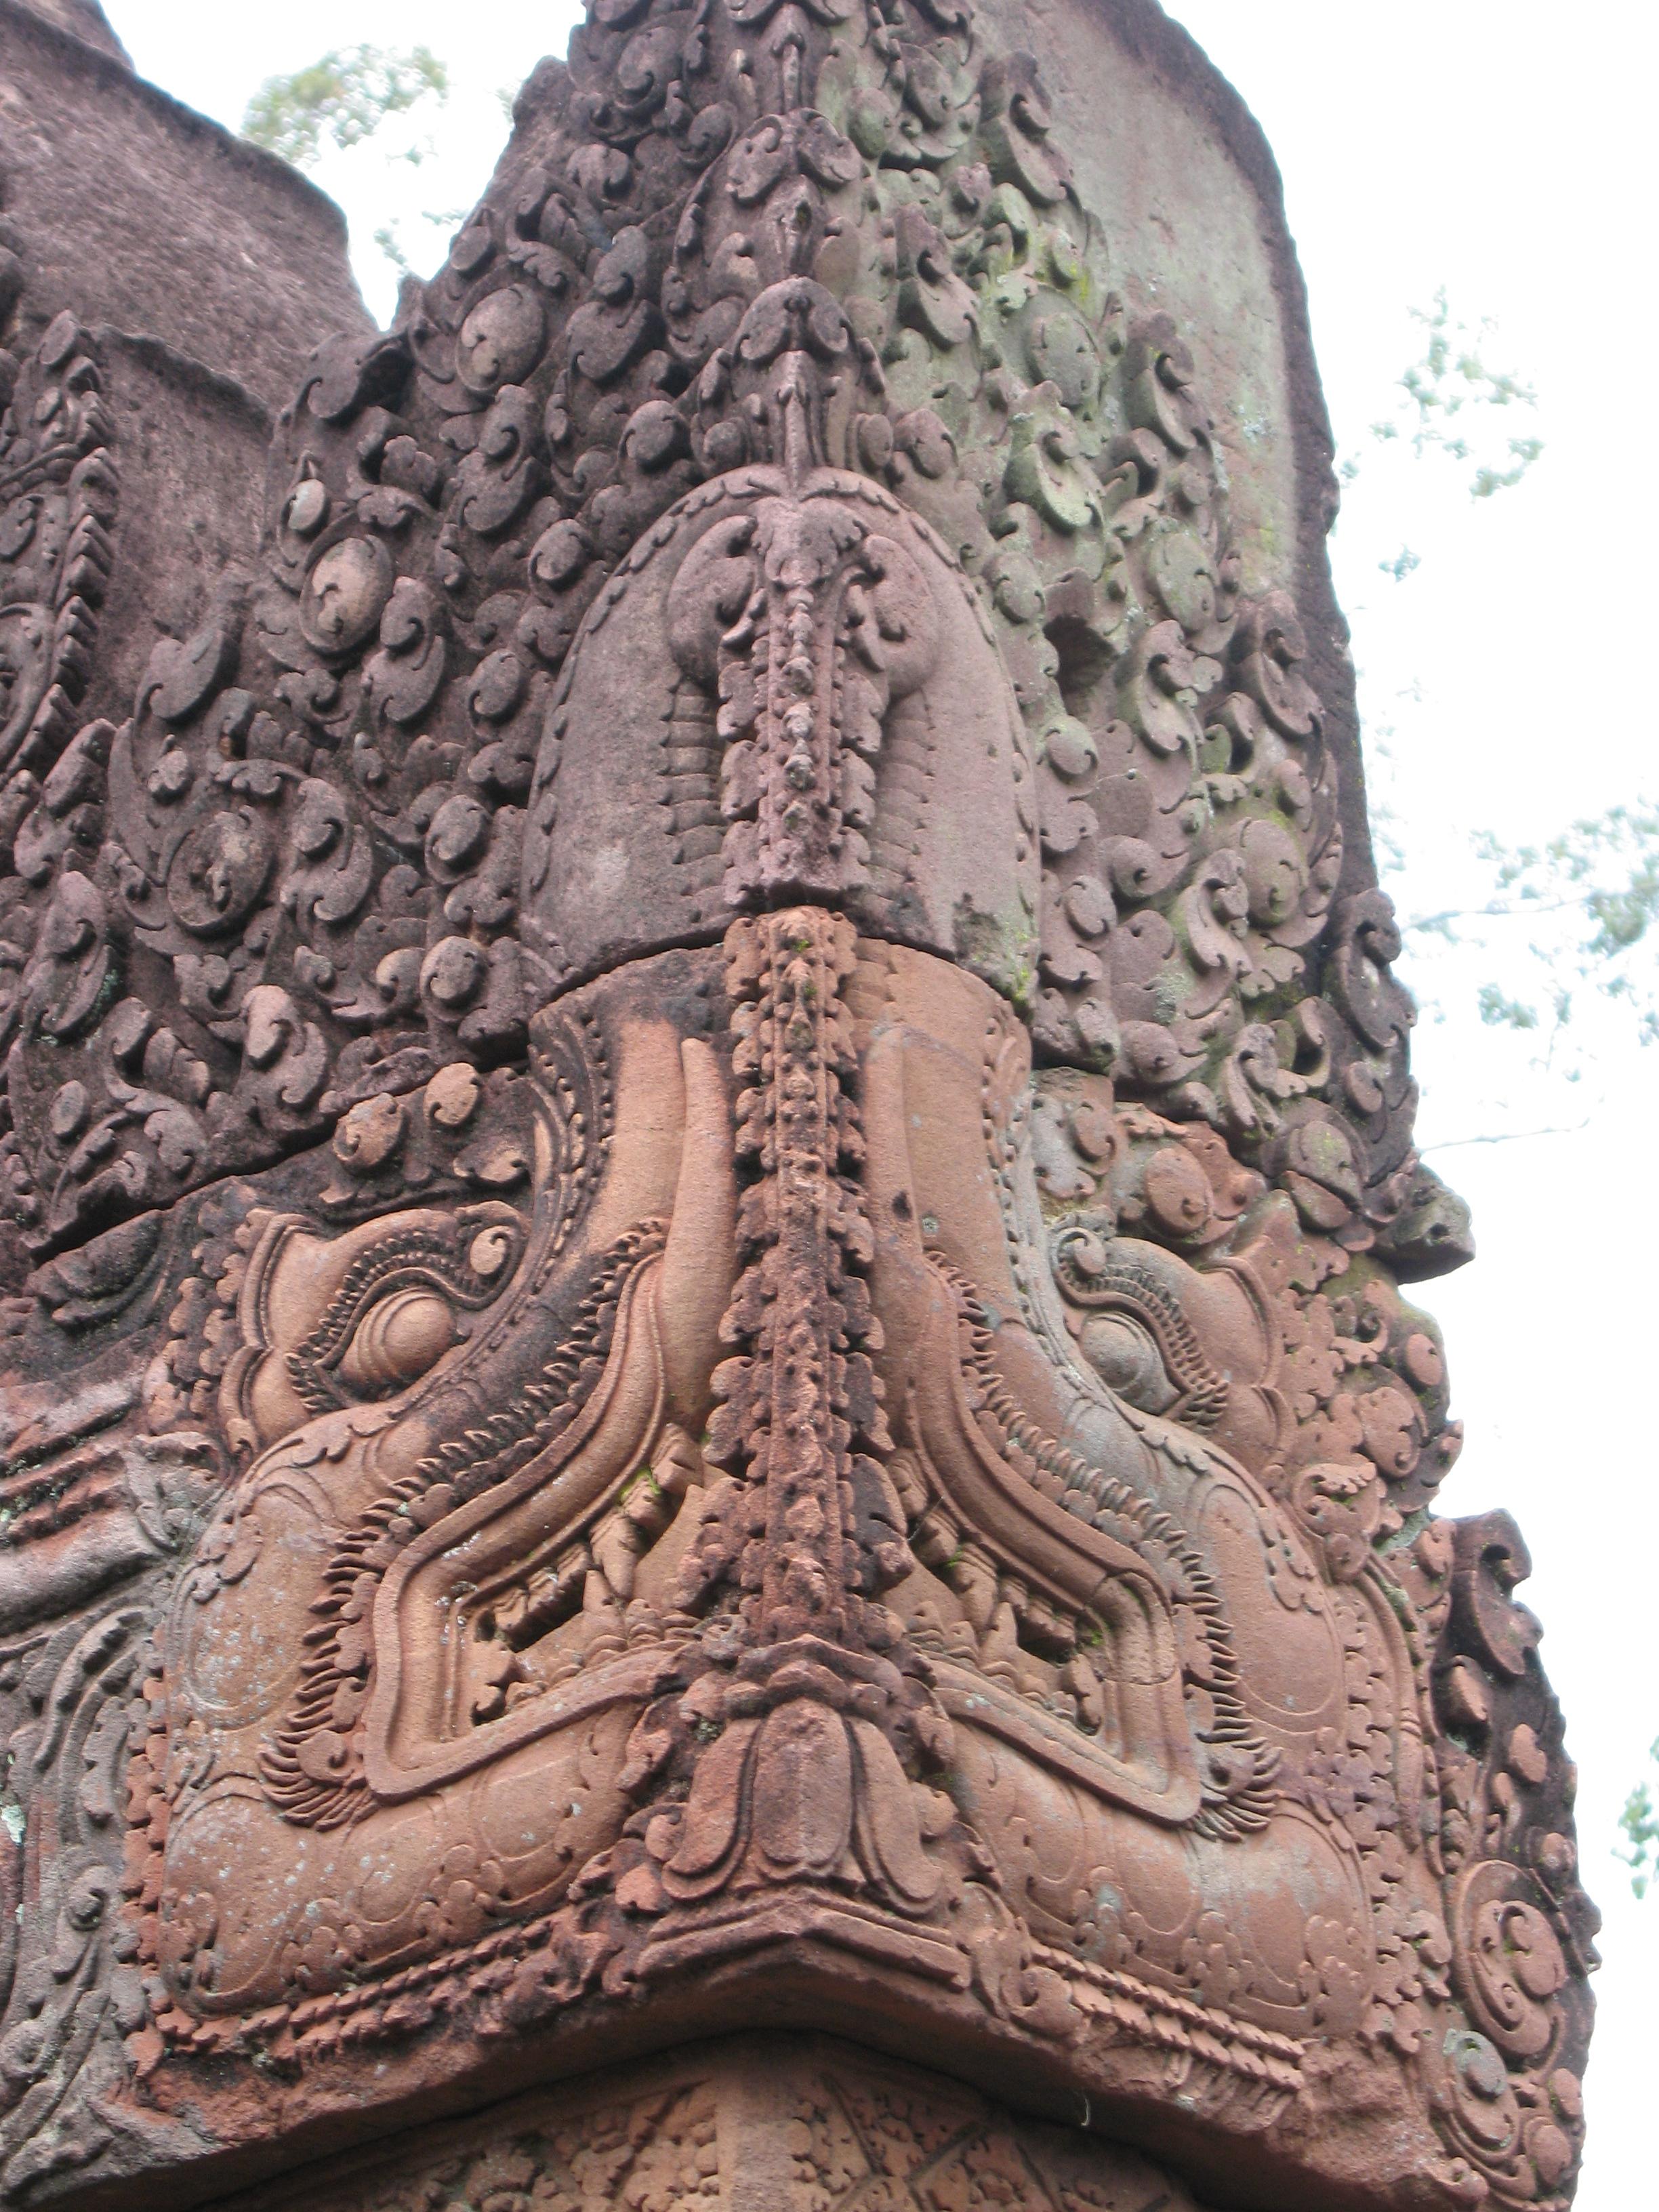 Banteay Srei stone elephants